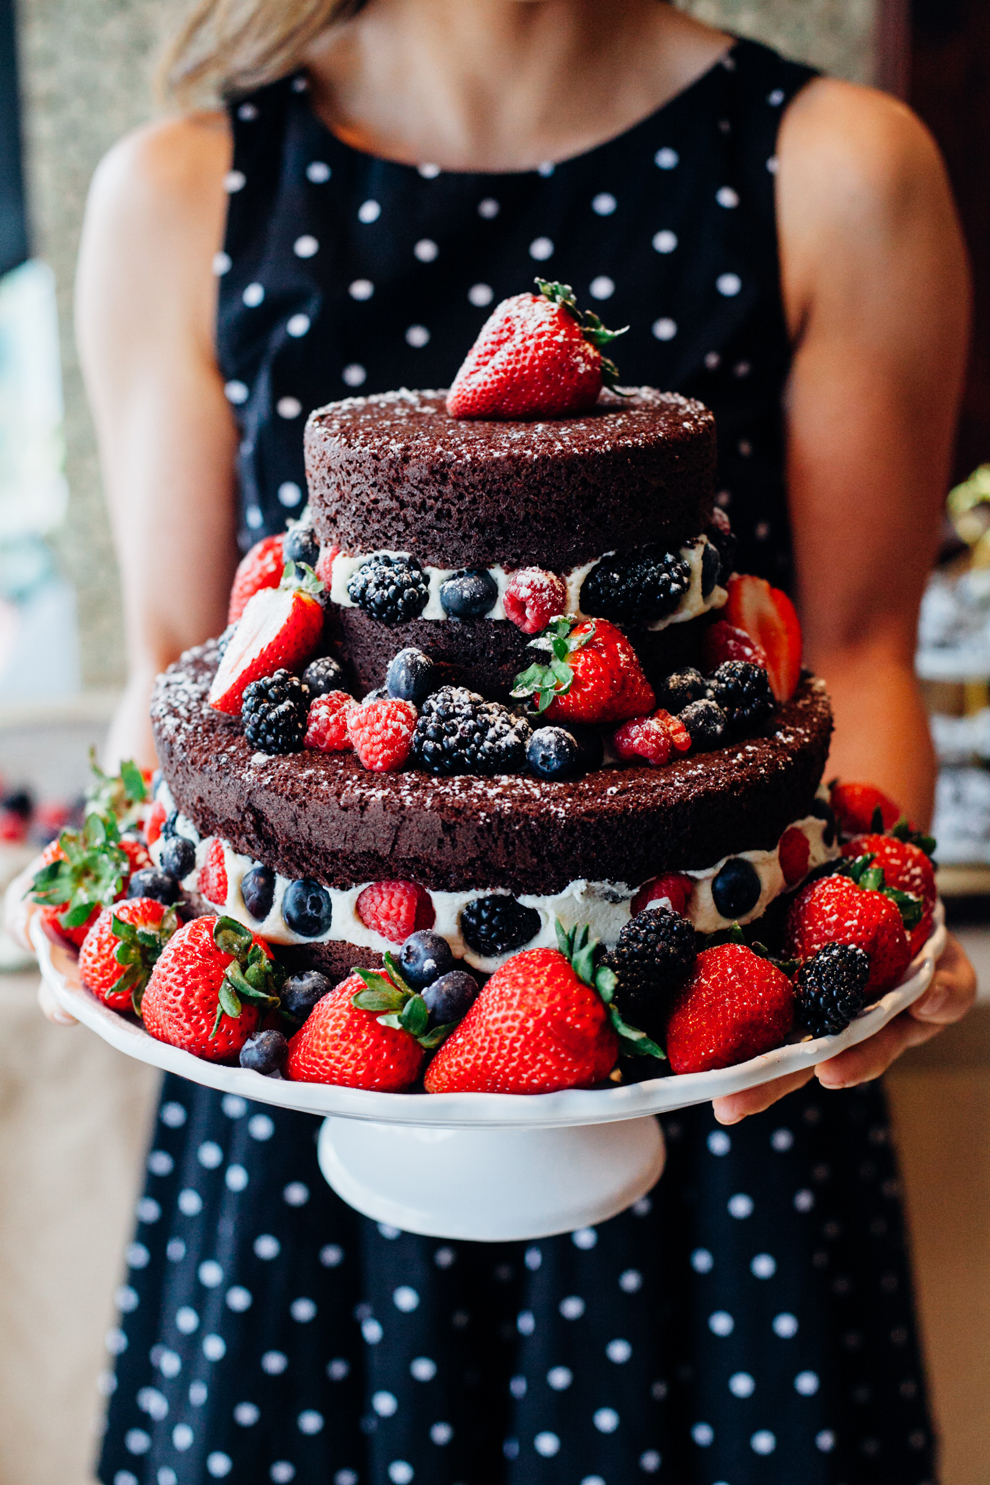 022-bellingham-marketing-photographer-bakery-slice-of-heaven-commercial-food-photo.jpg